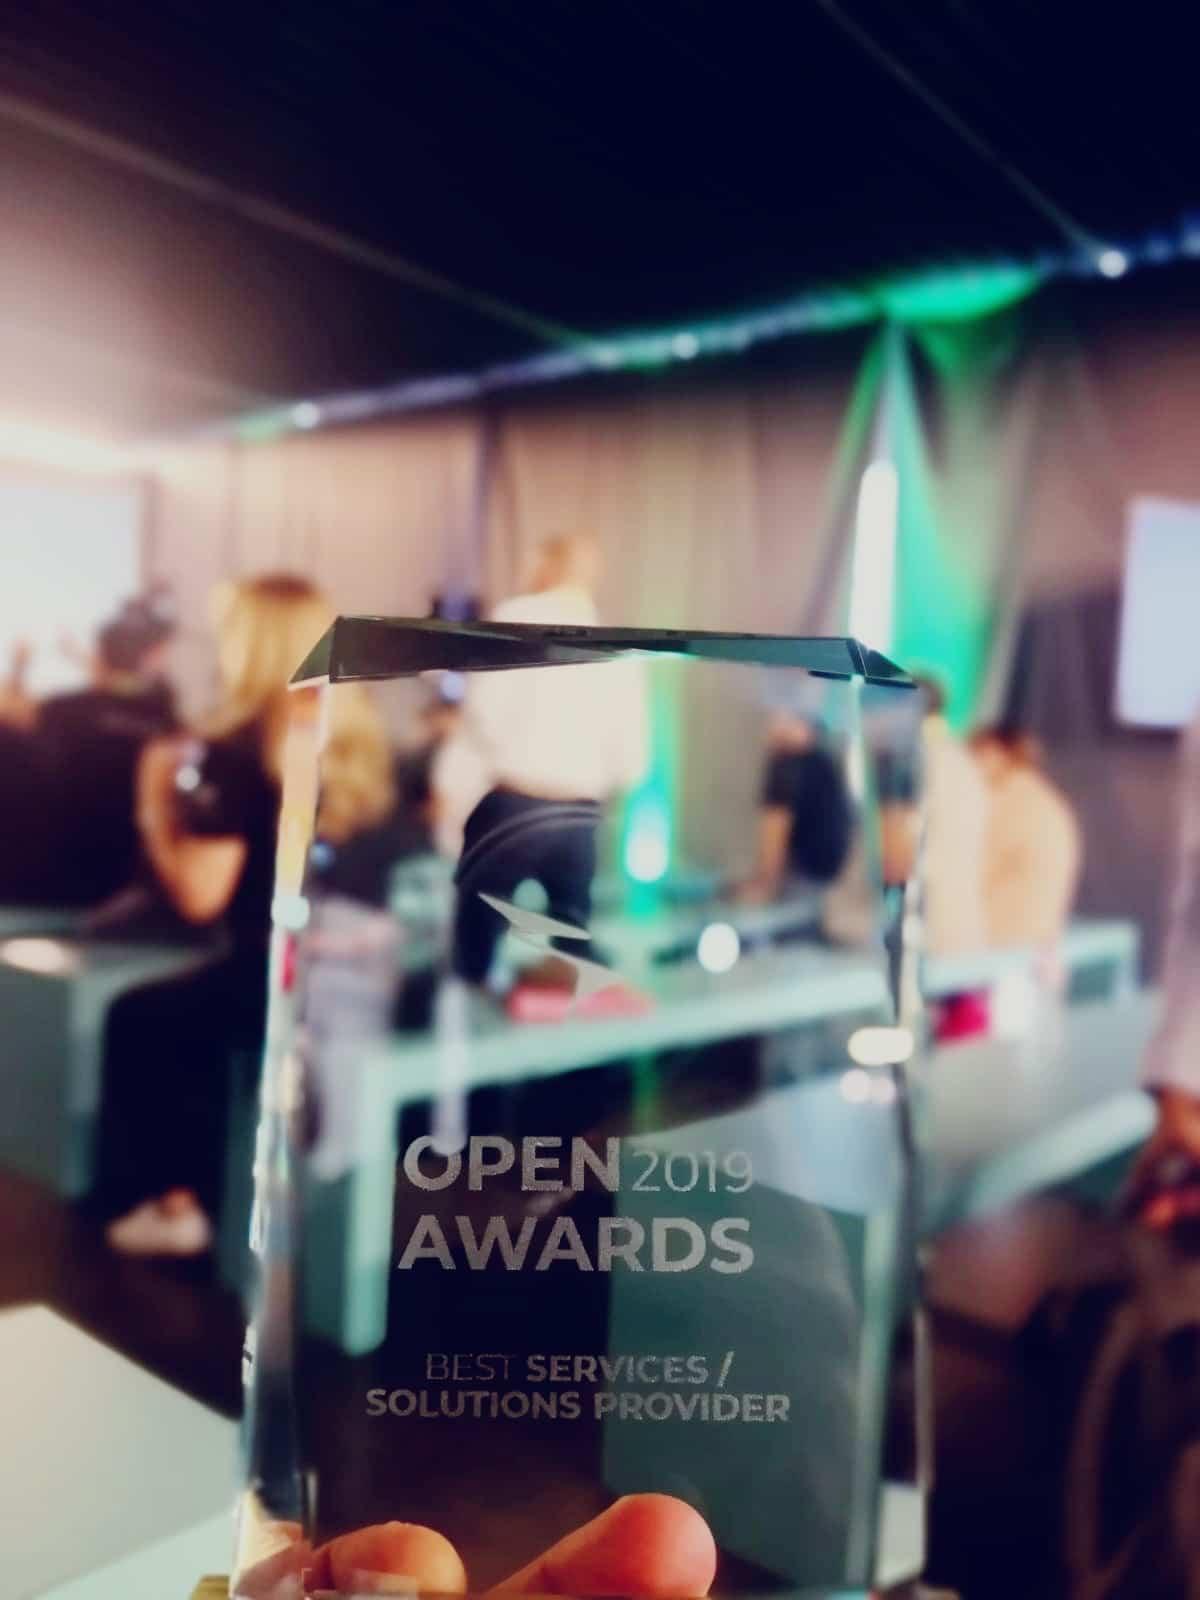 irontec open awards 2019